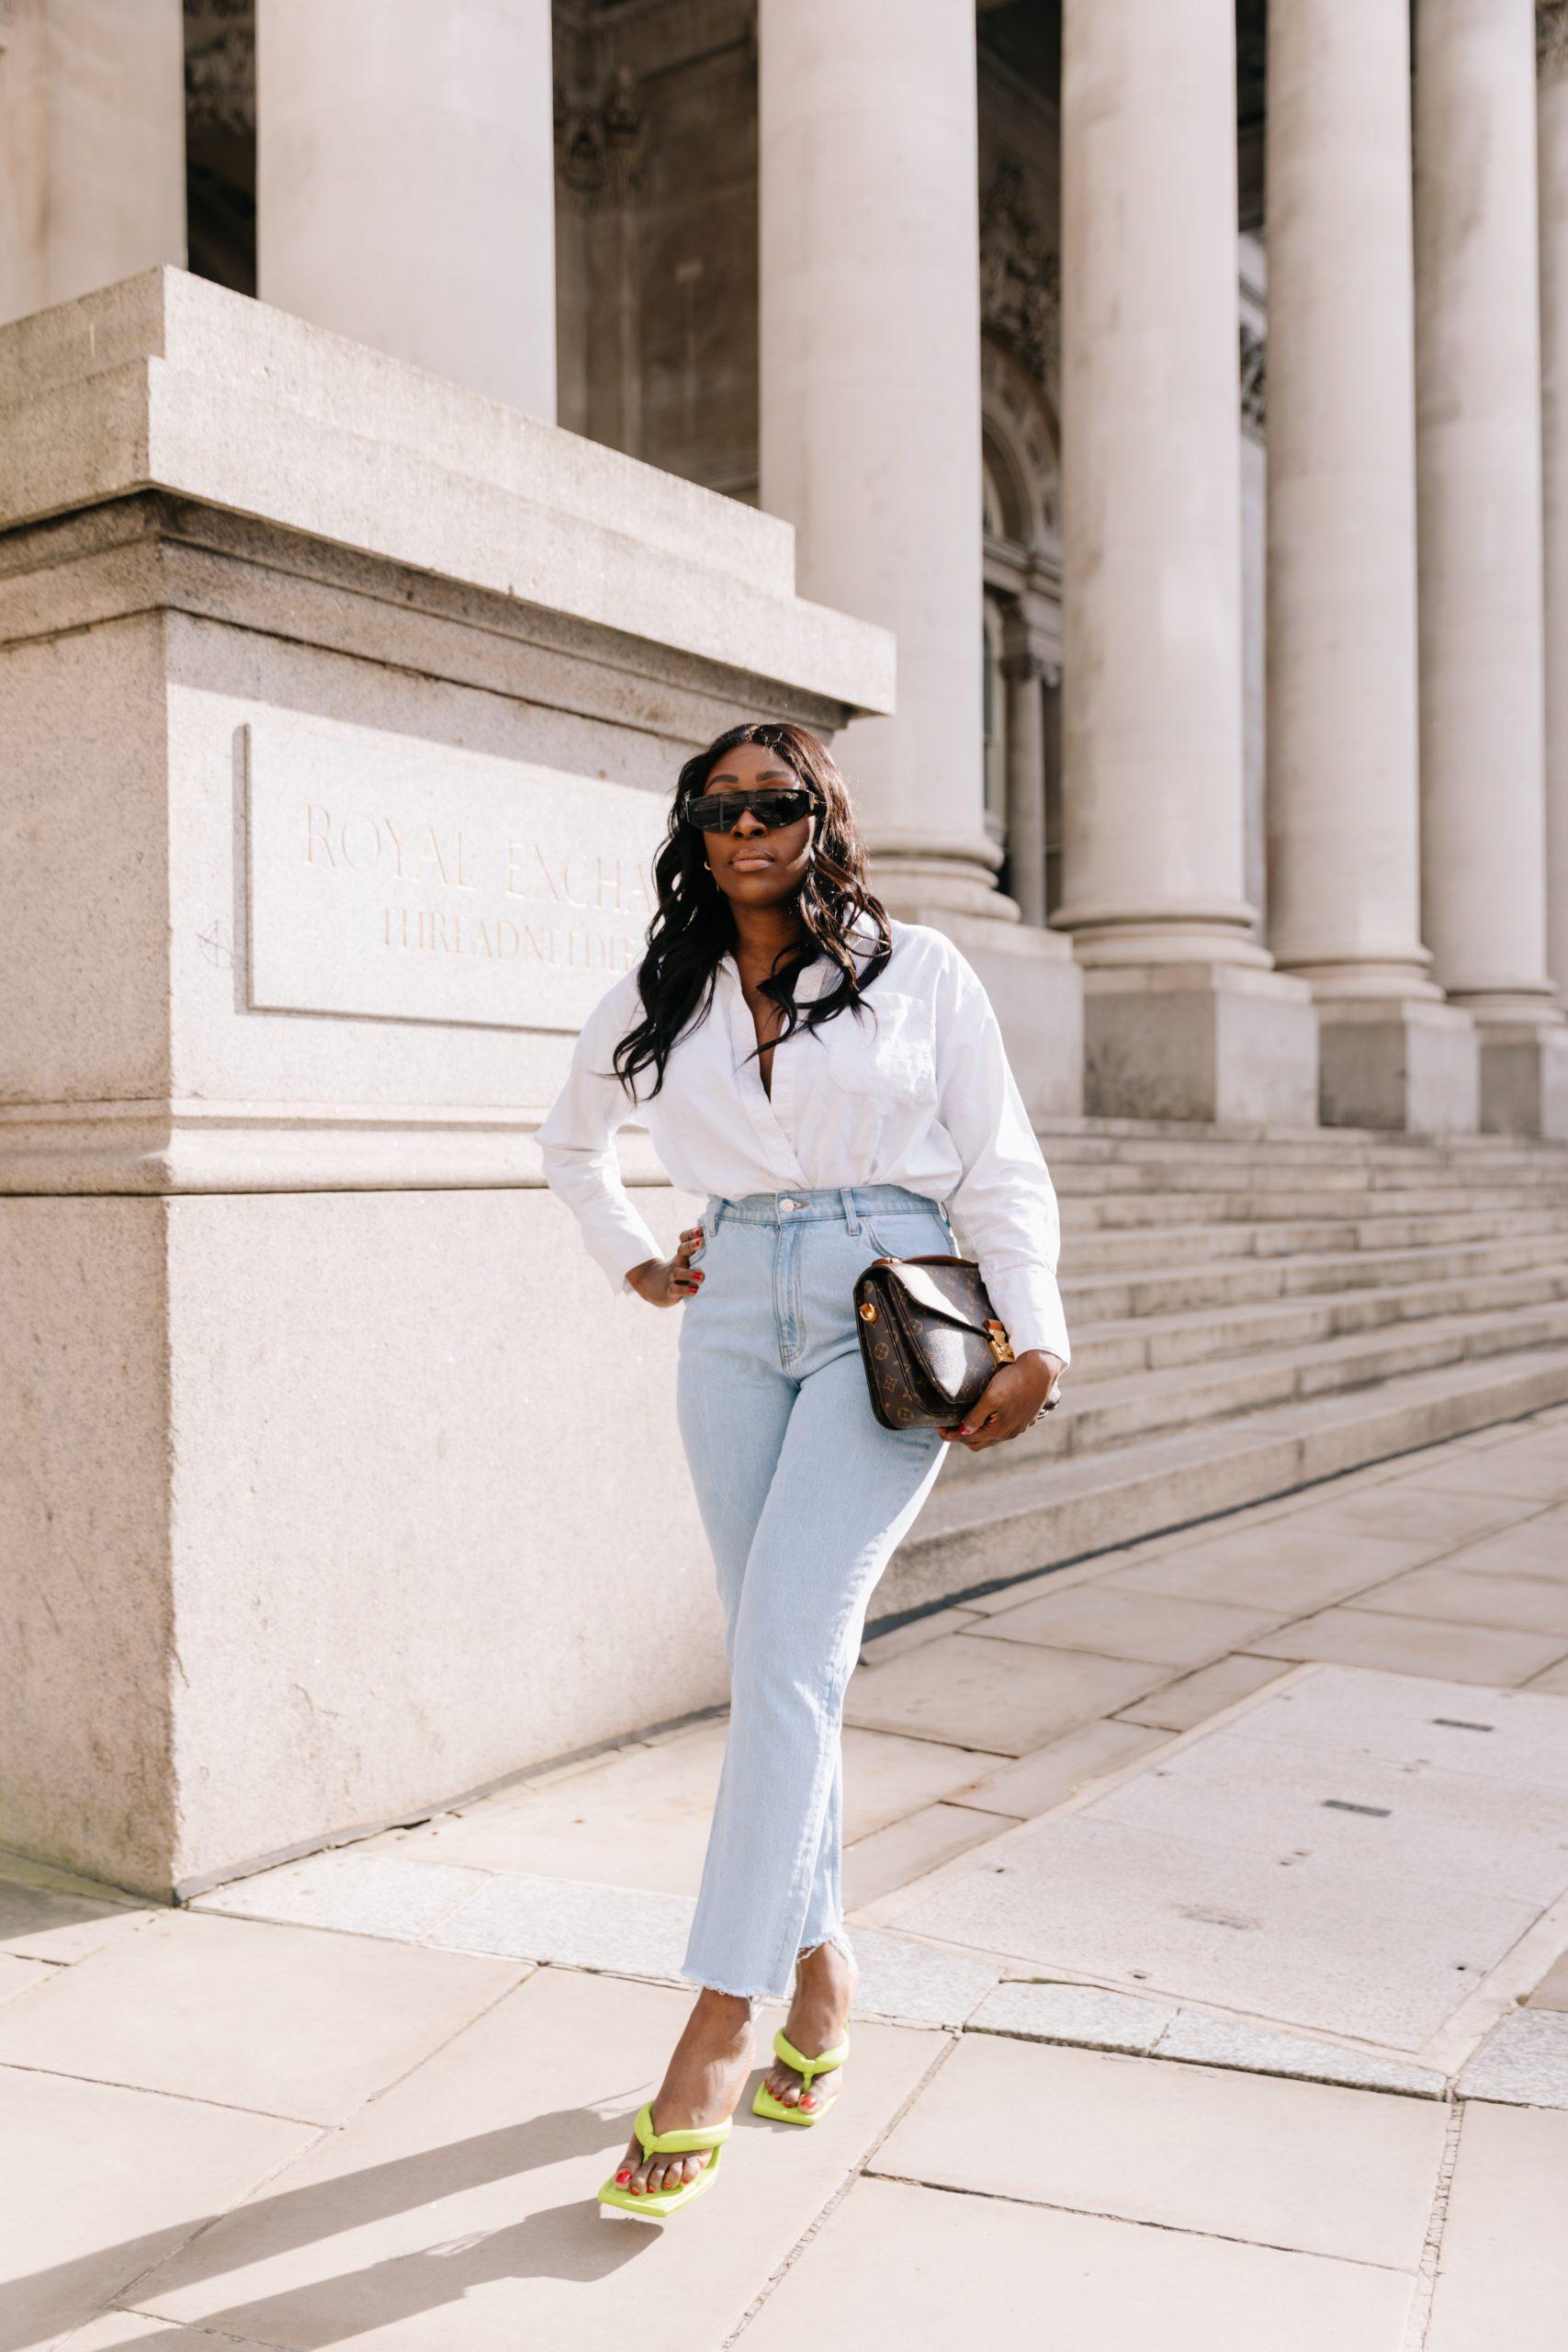 High Waisted Jeans & Denim Trends - high waisted jeans - louis vuitton pochette metis - Tasha Antwi